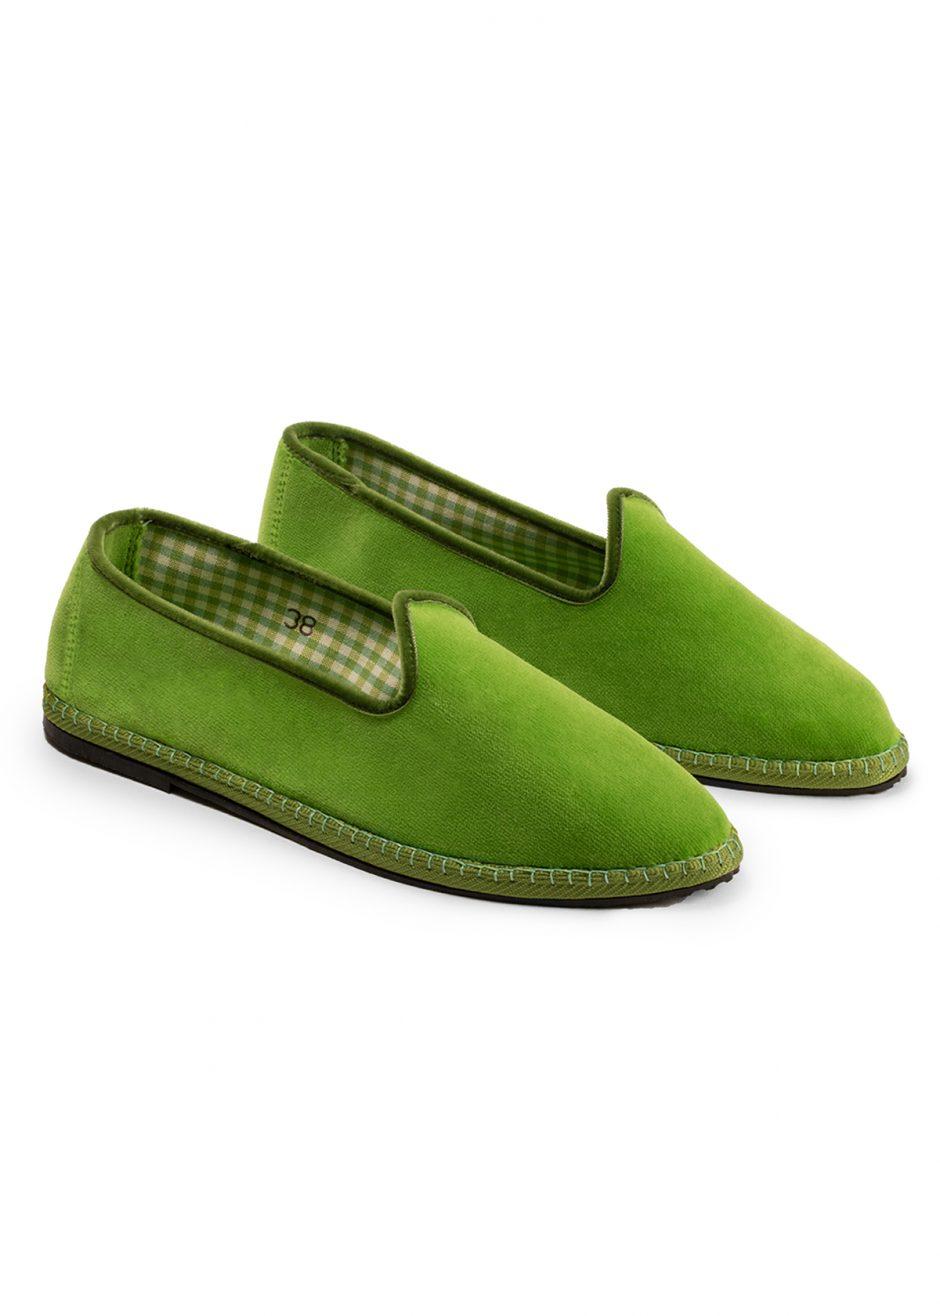 Rialto – Furlana apple green velvet